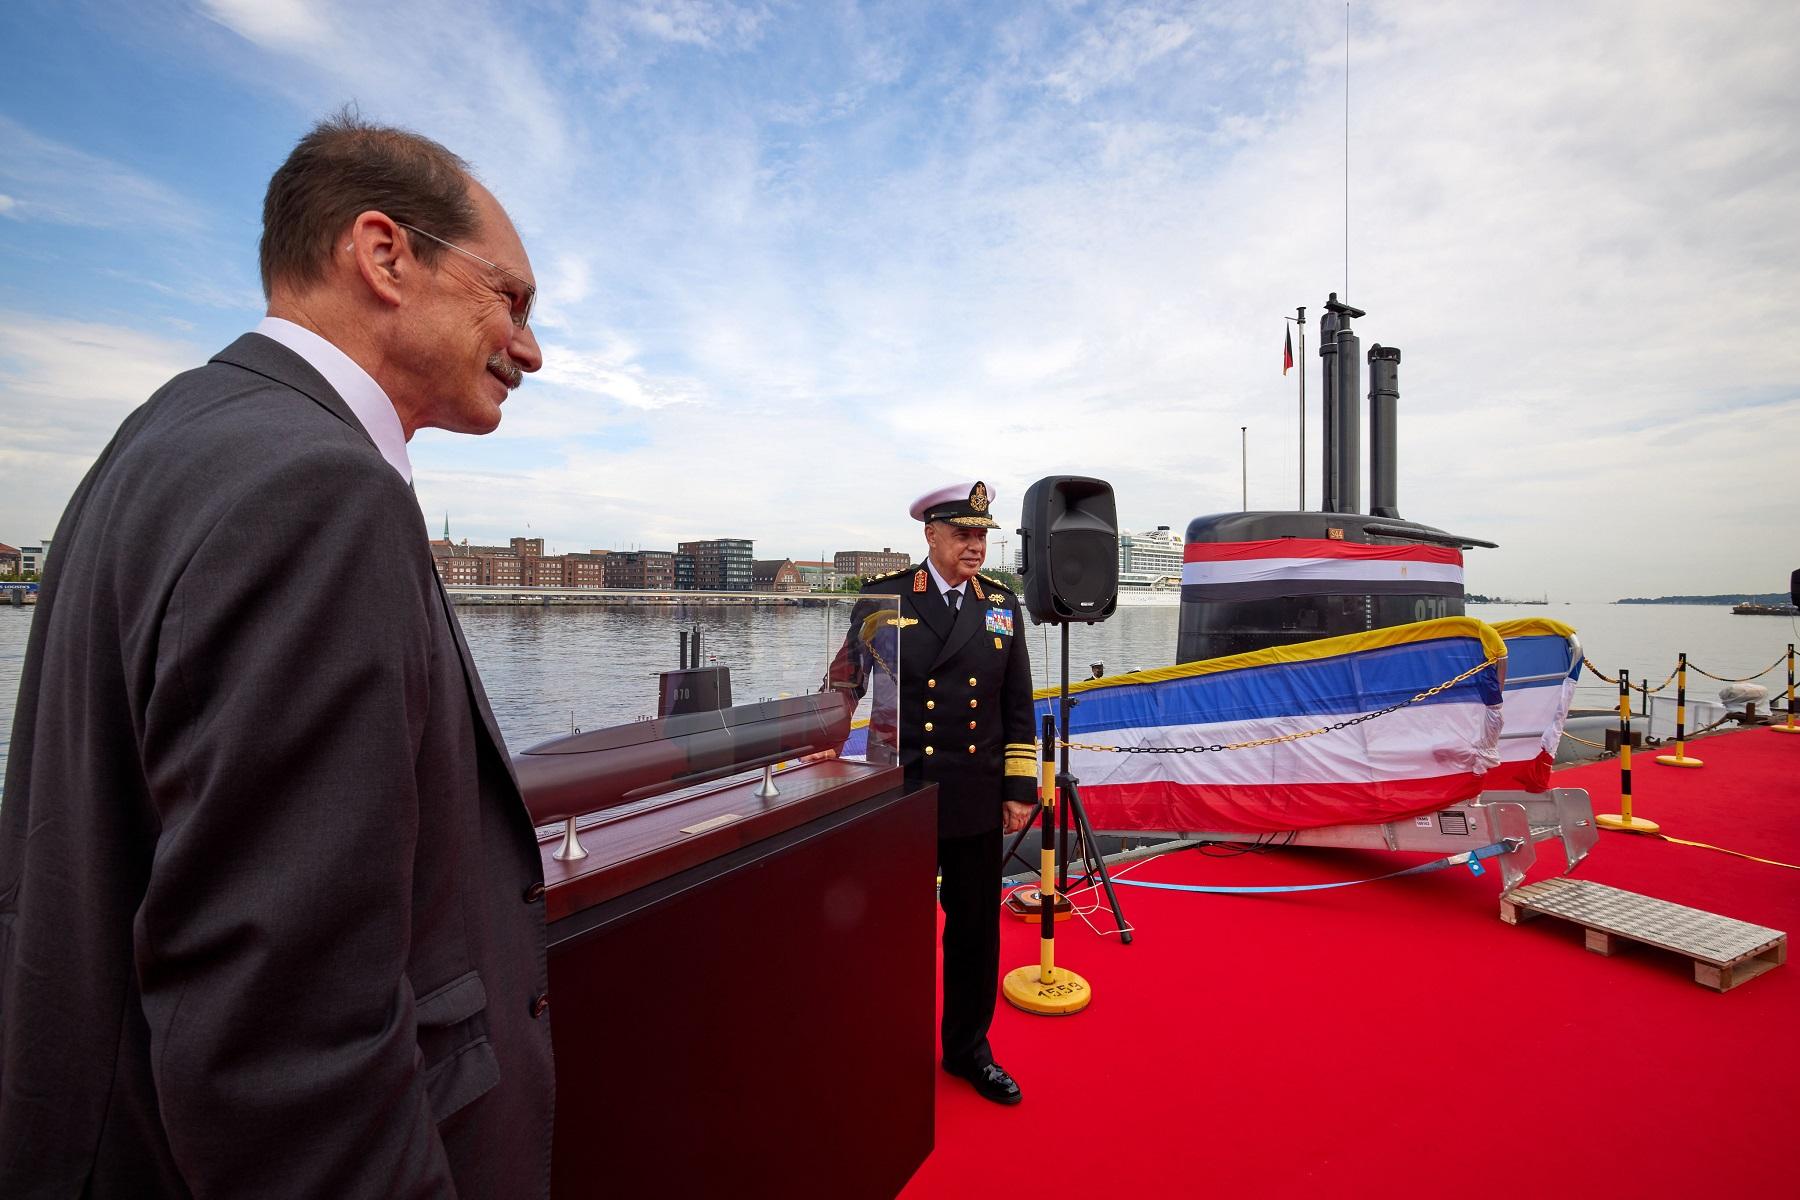 thyssenkrupp Marine Systems Hands Over Fourth 209/1400mod Class Submarine to Egyptian Navy